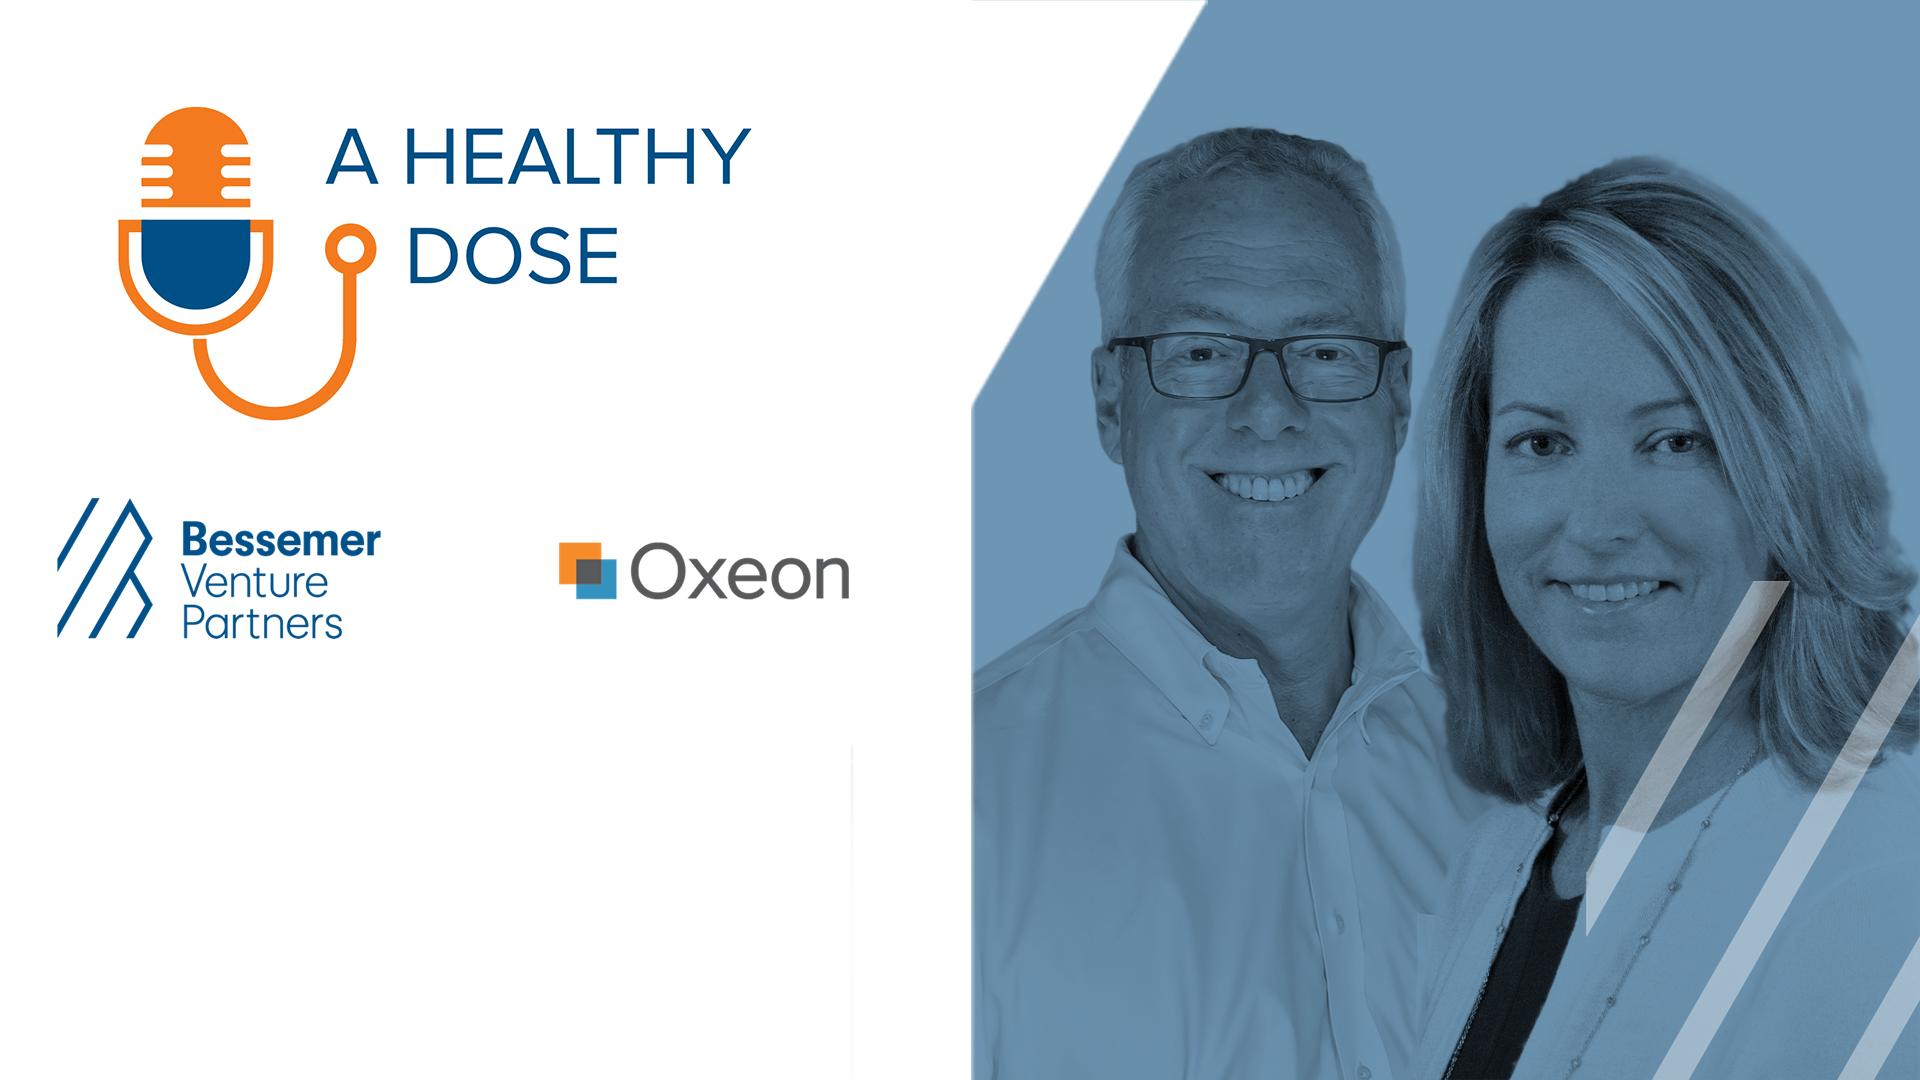 A Healthy Dose Lonny Reisman and Lori Bernstein